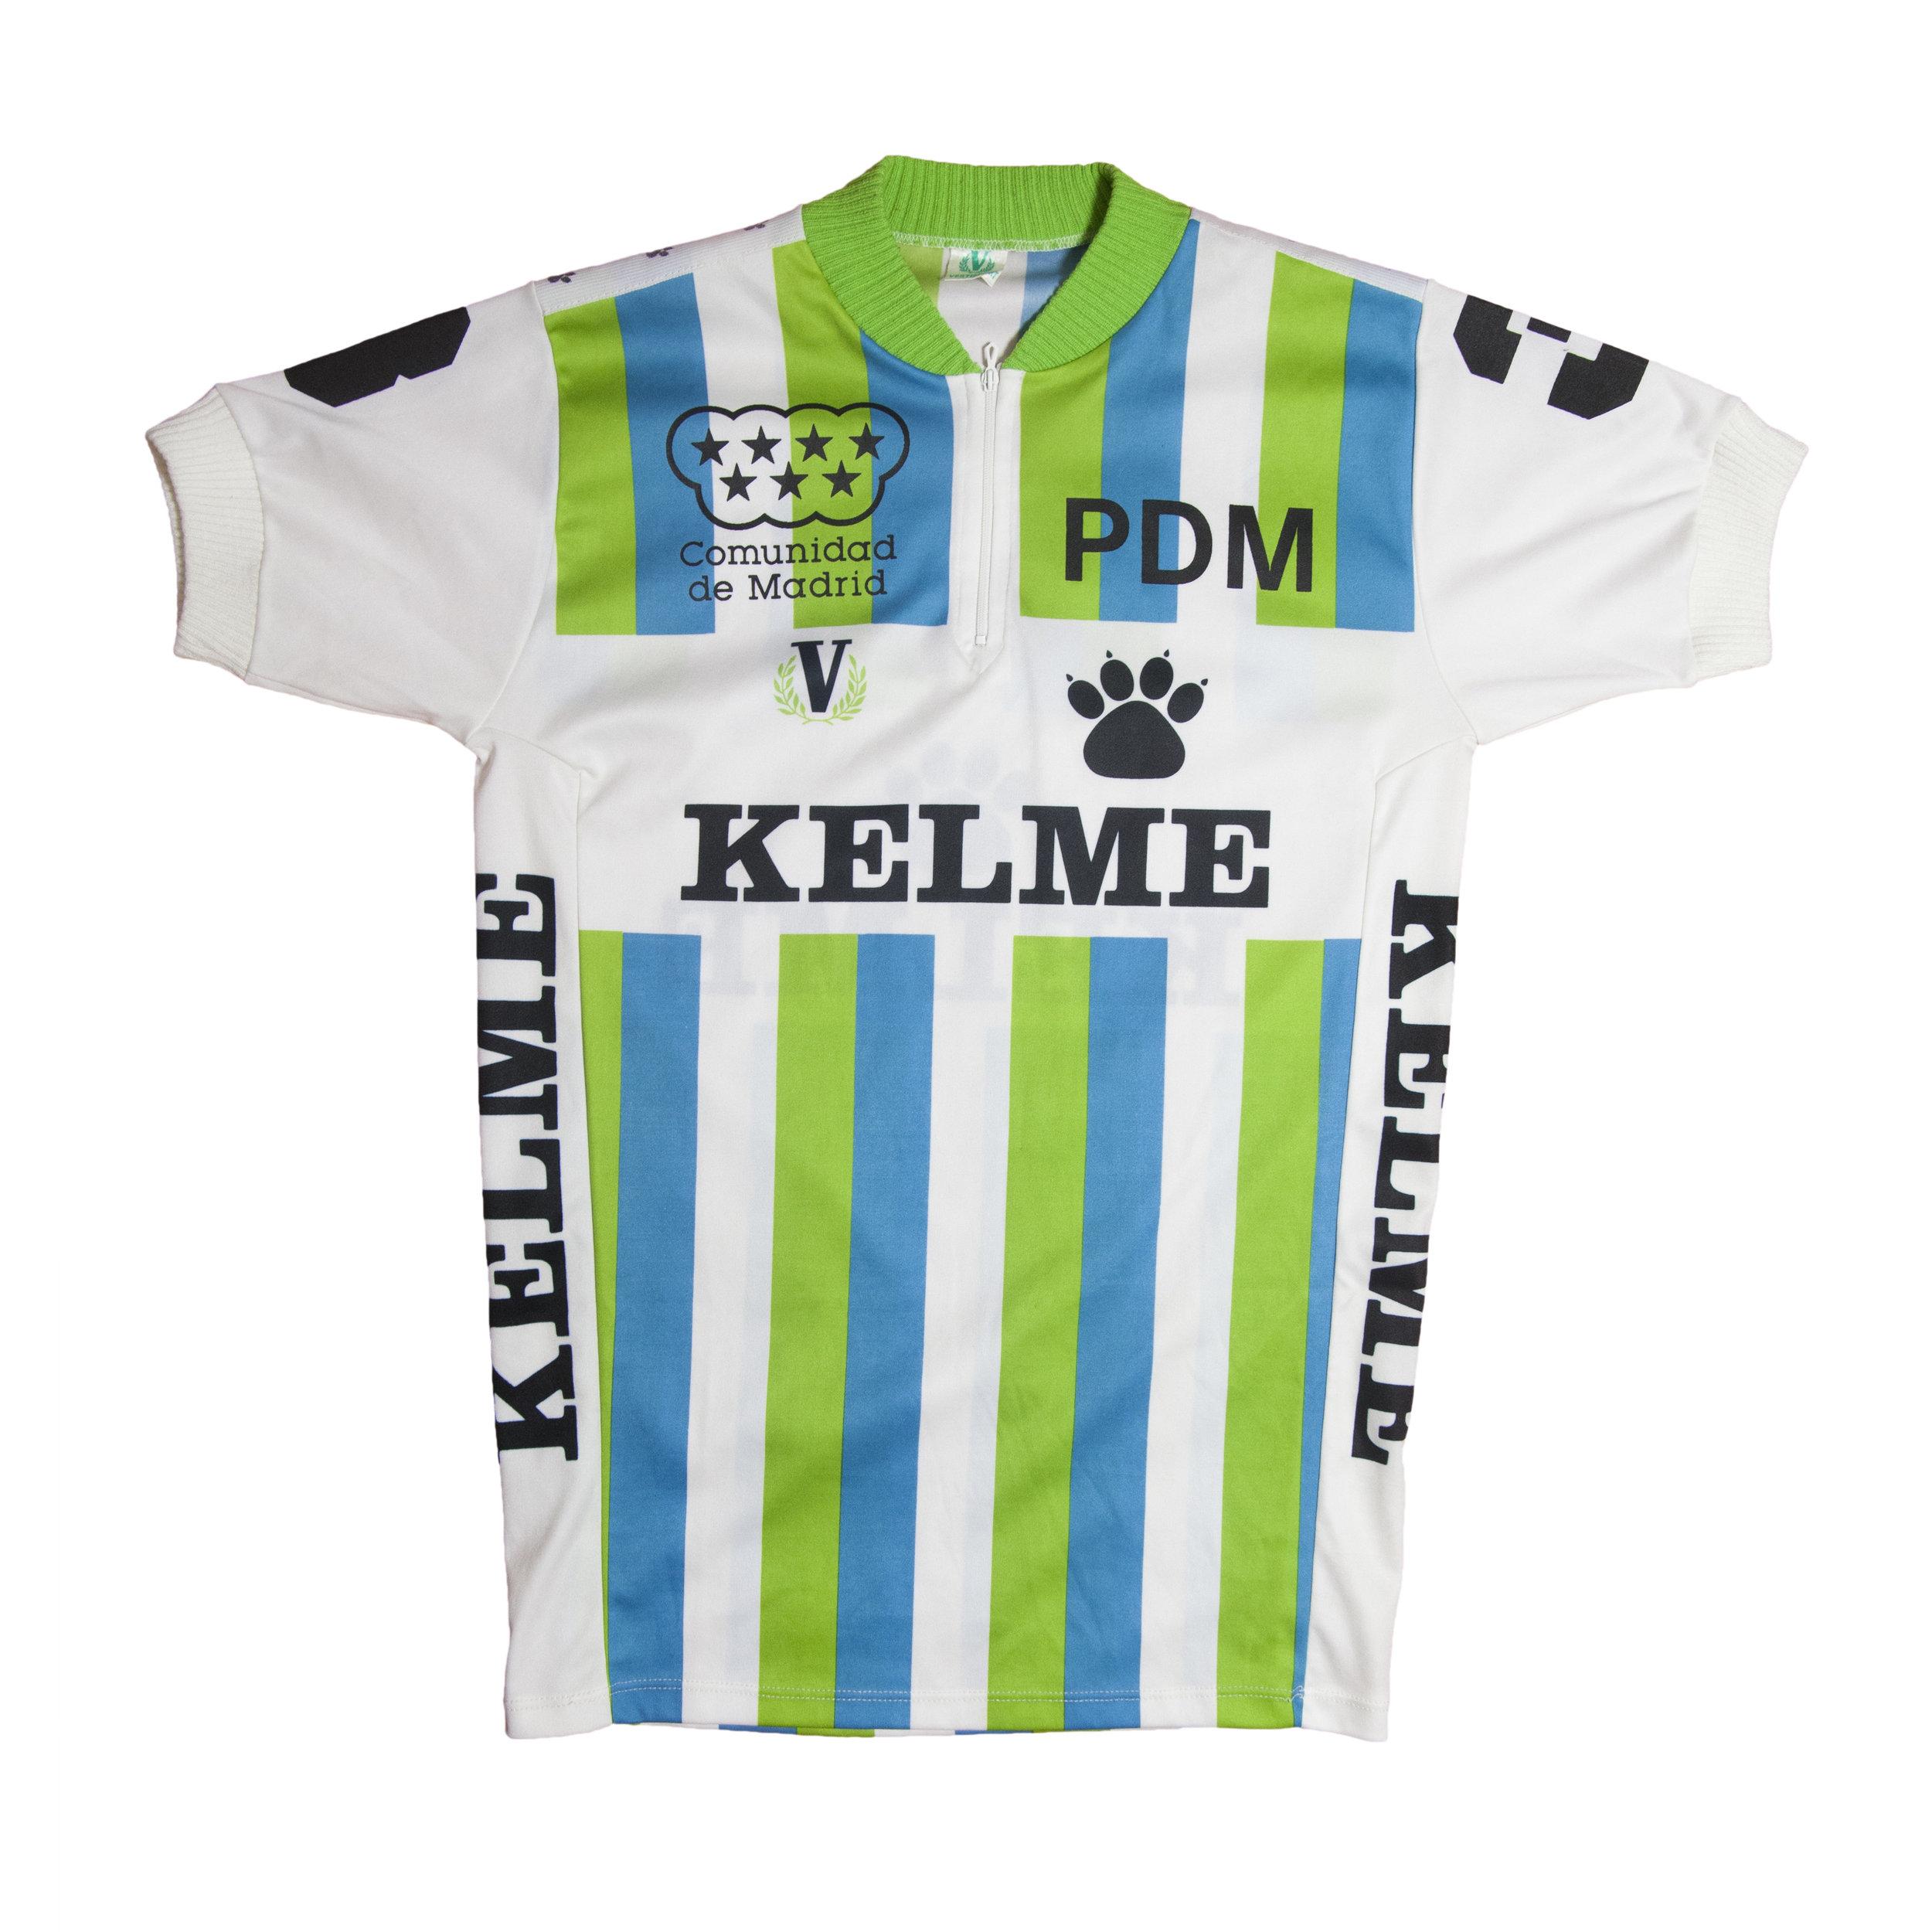 1986 - PDM - Kelme (Zesdaagse Madrid)